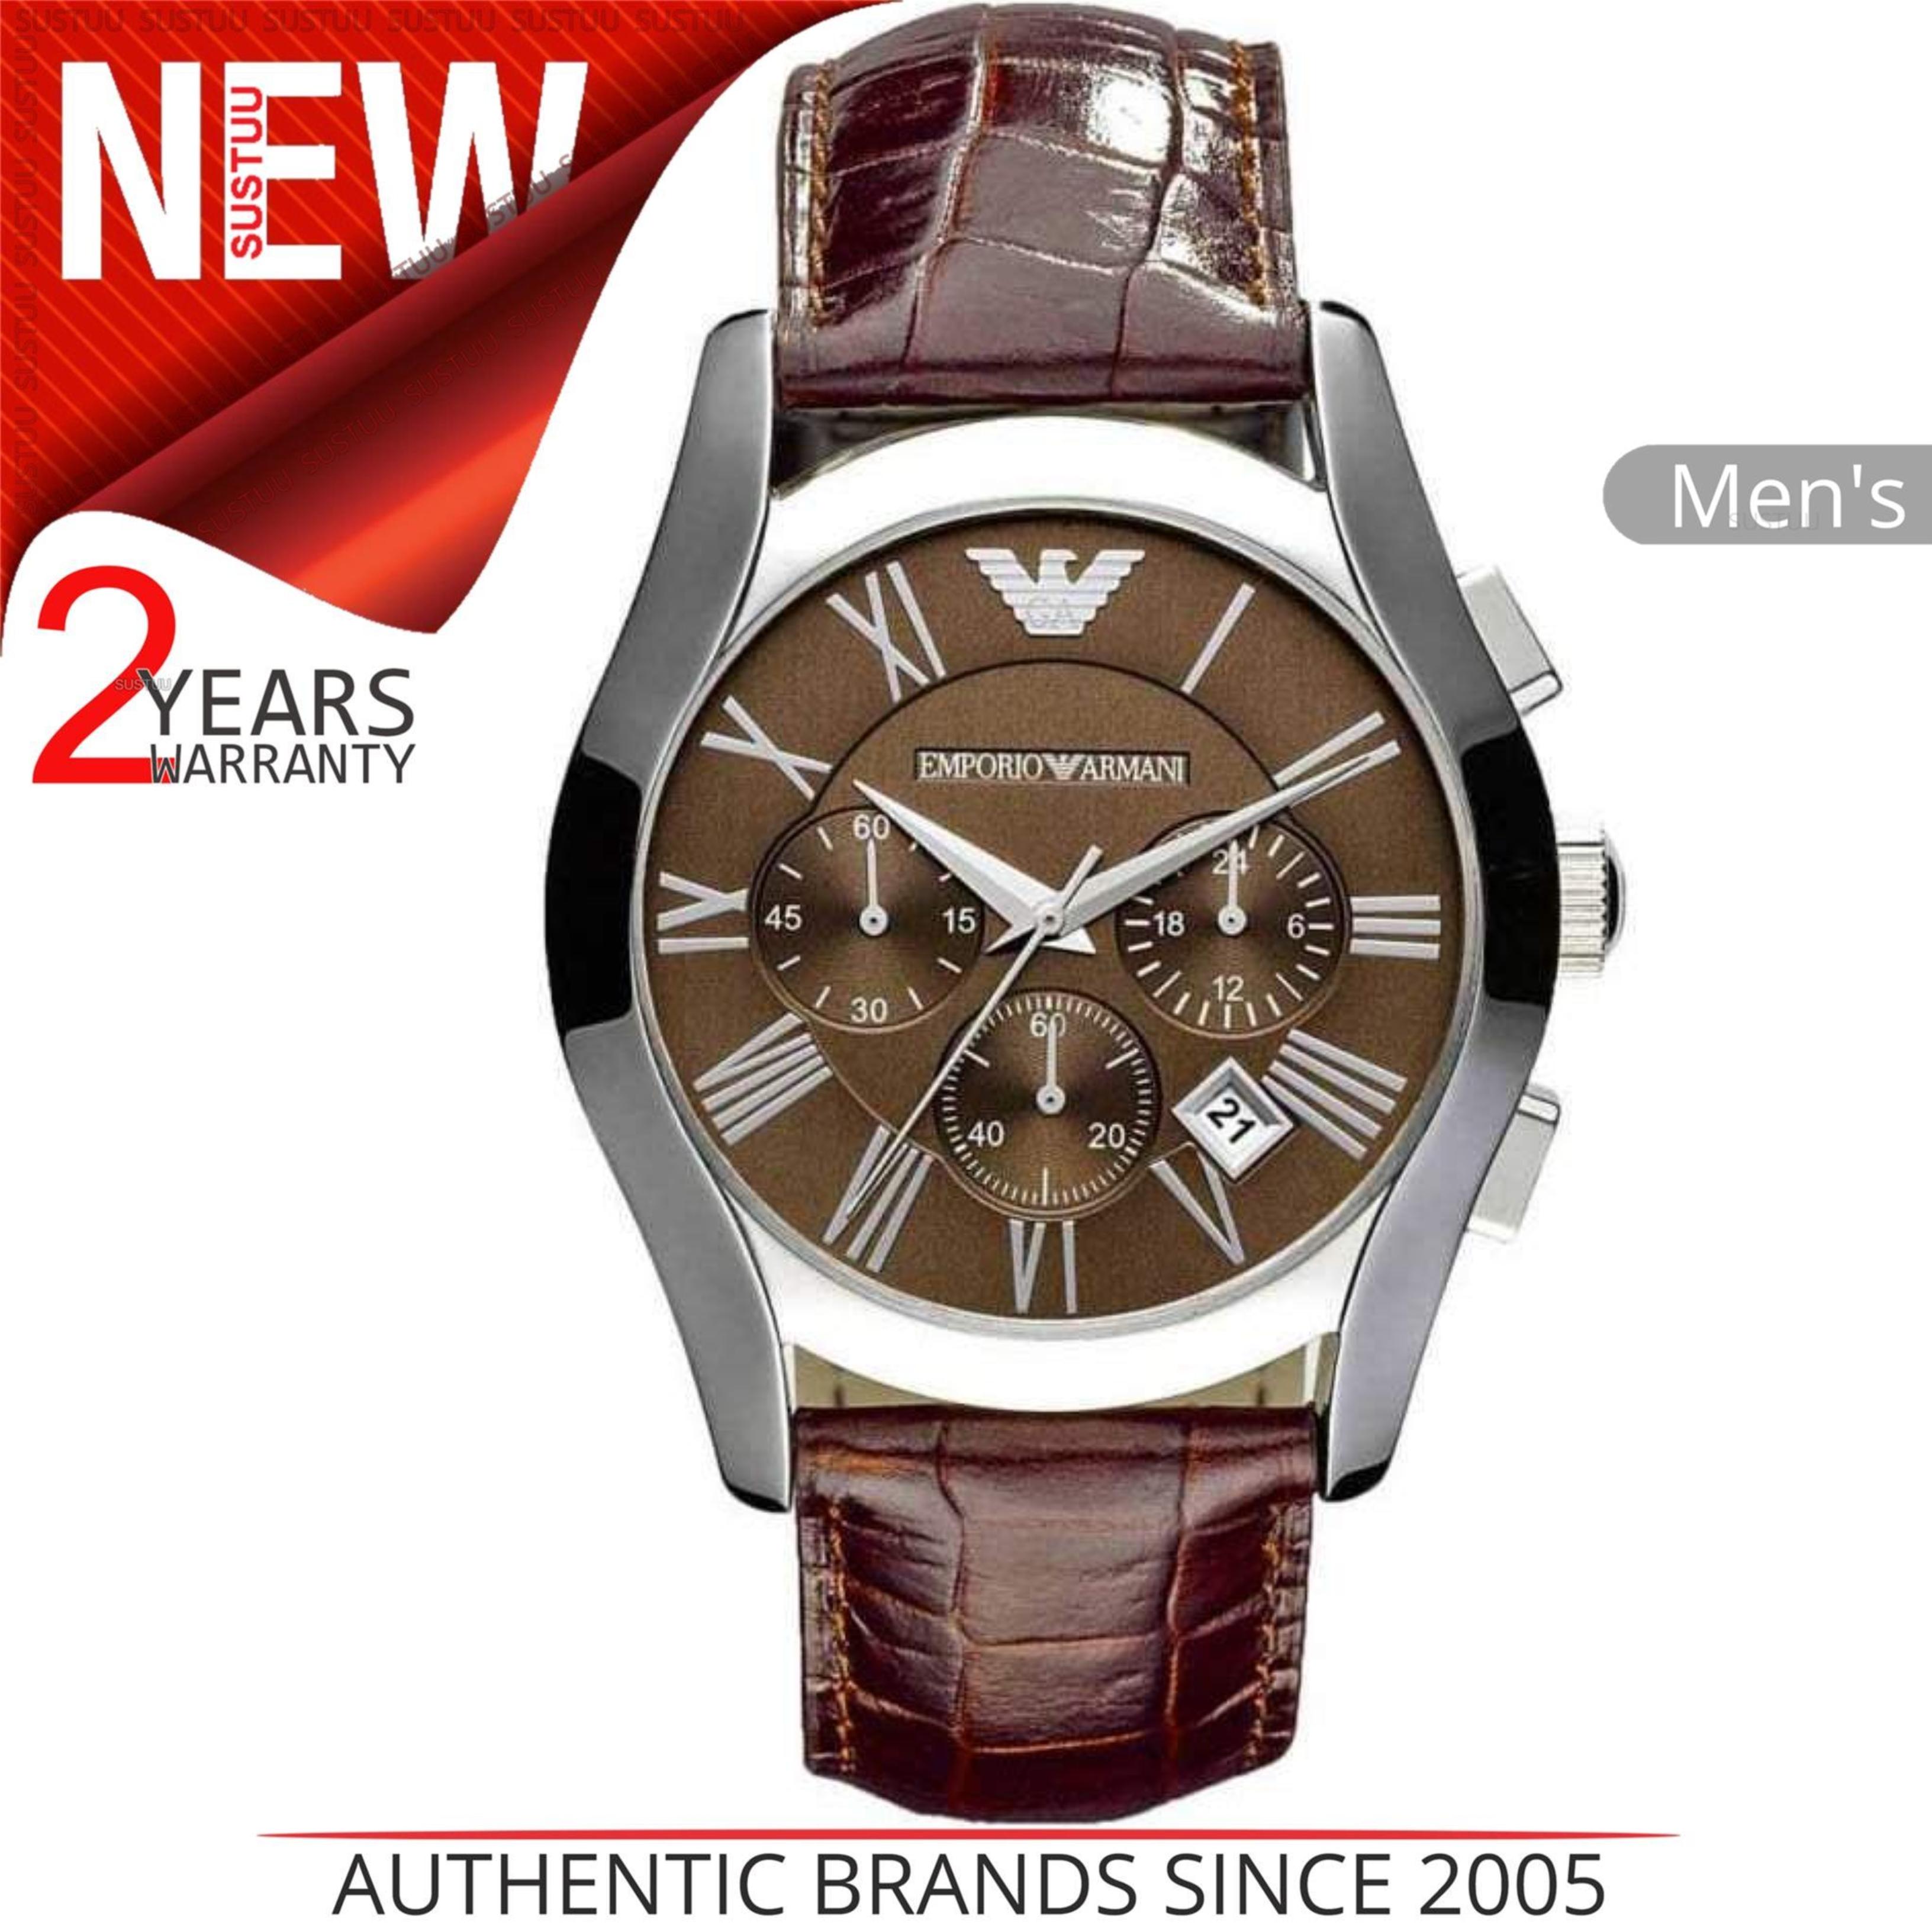 Emporio Armani Classic Men's Watch?Chronograph Design?Brown Leather Strap?AR0671